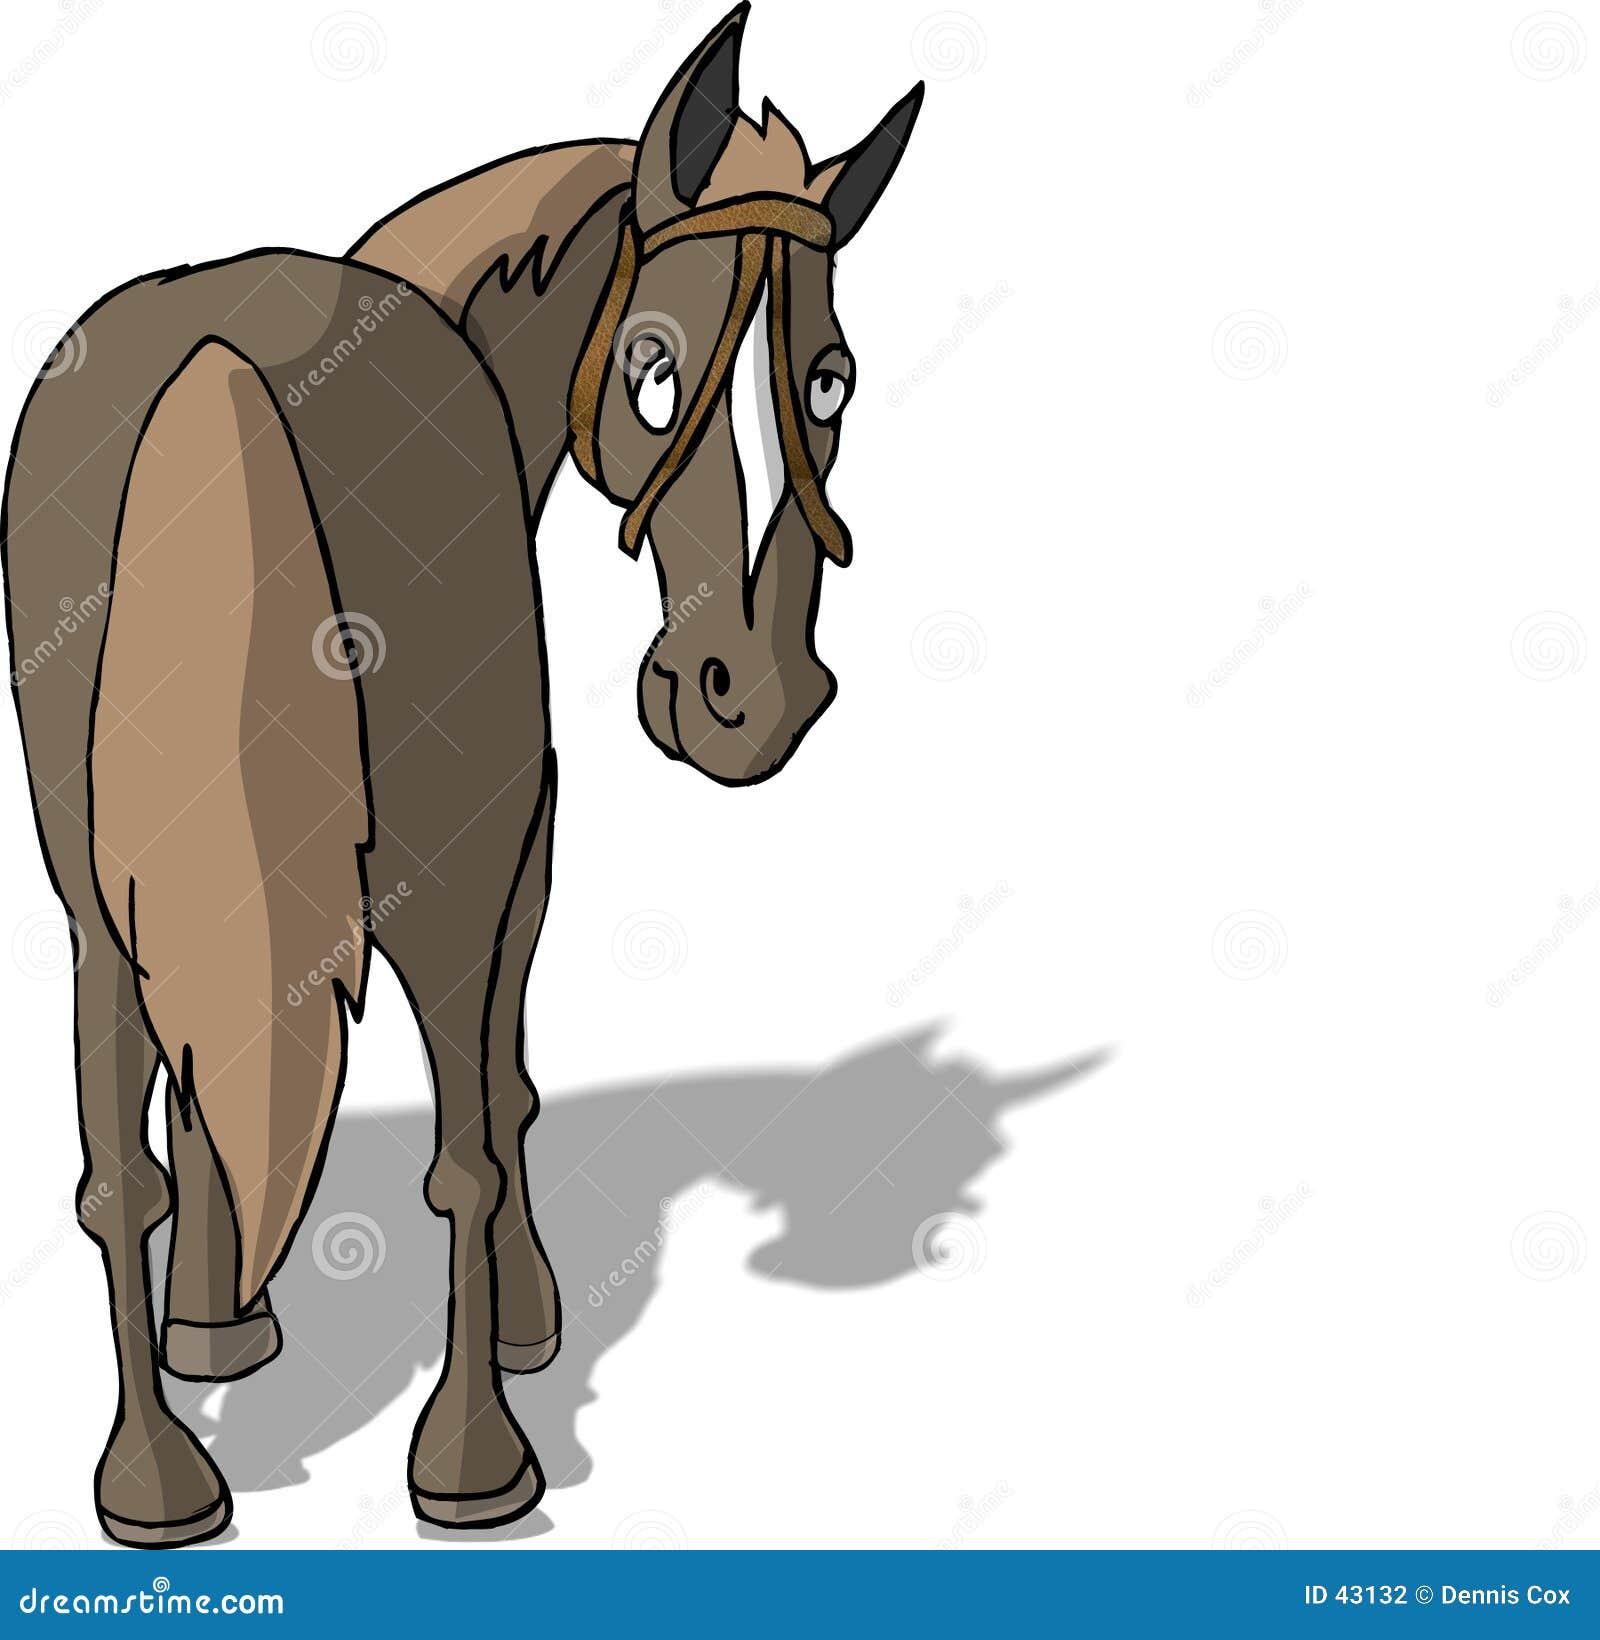 Le dos du cheval